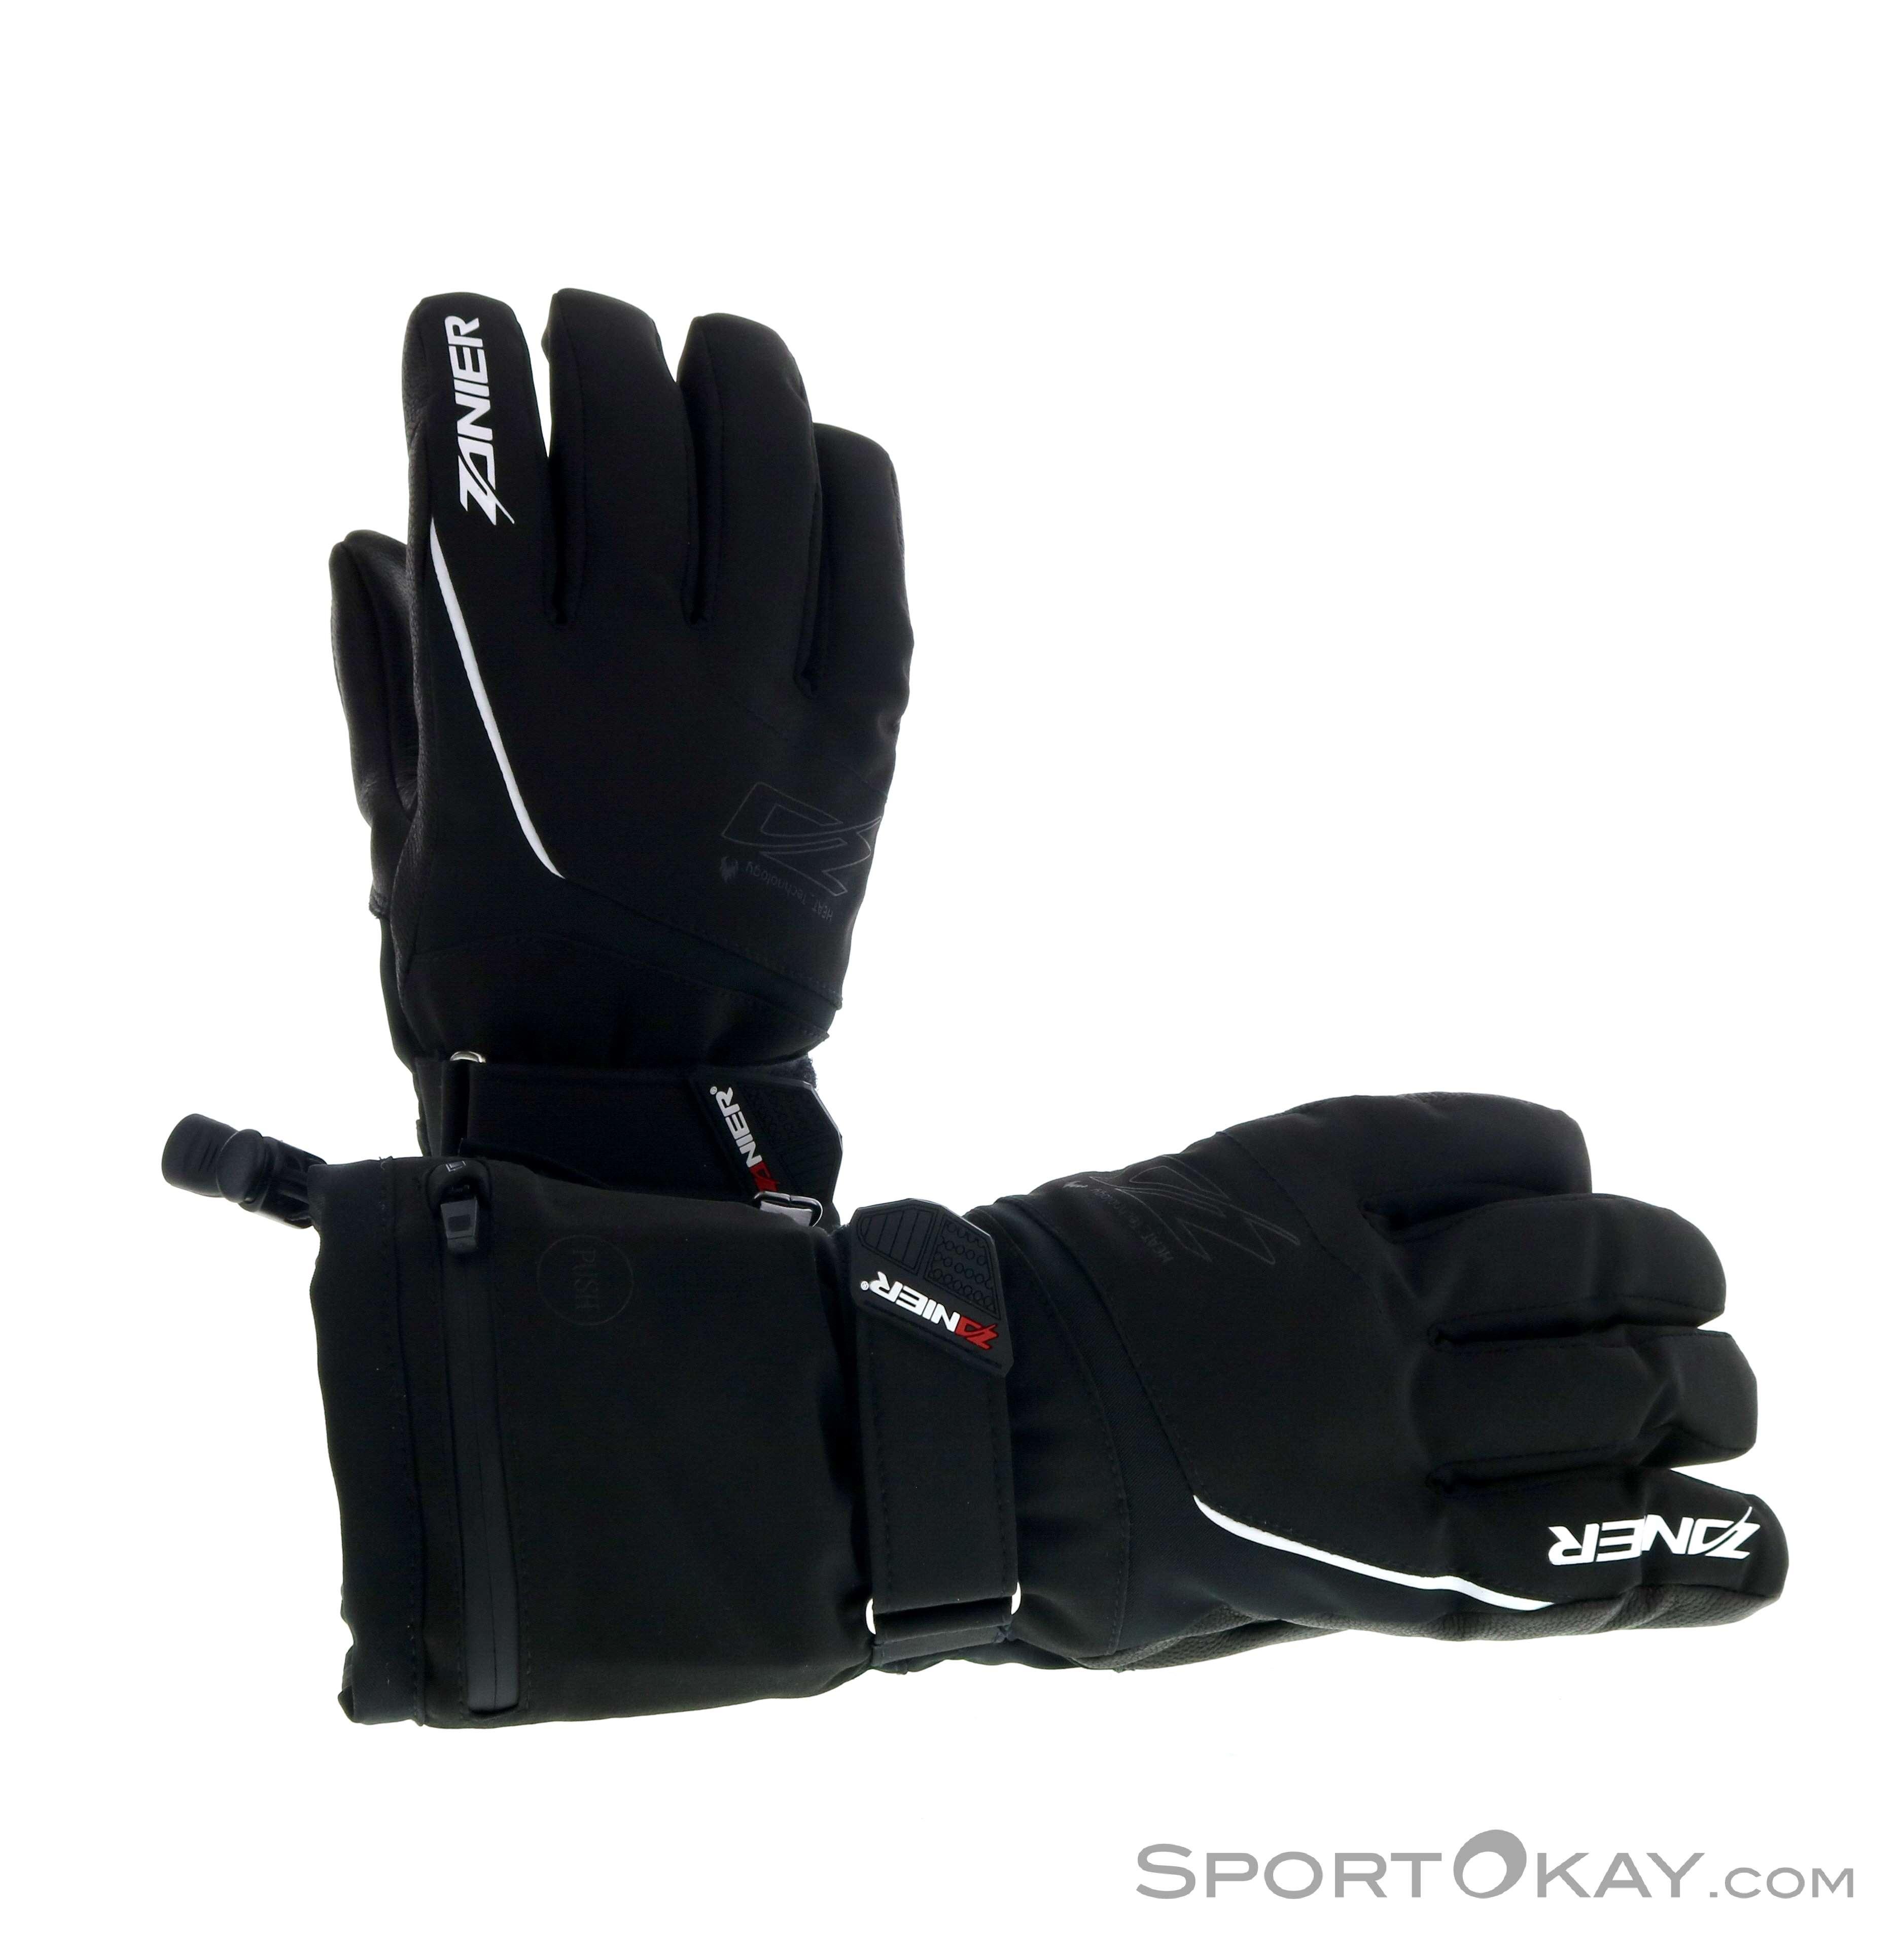 Zanier Heat ZX 3.0 Damen Handschuhe-Schwarz-XL